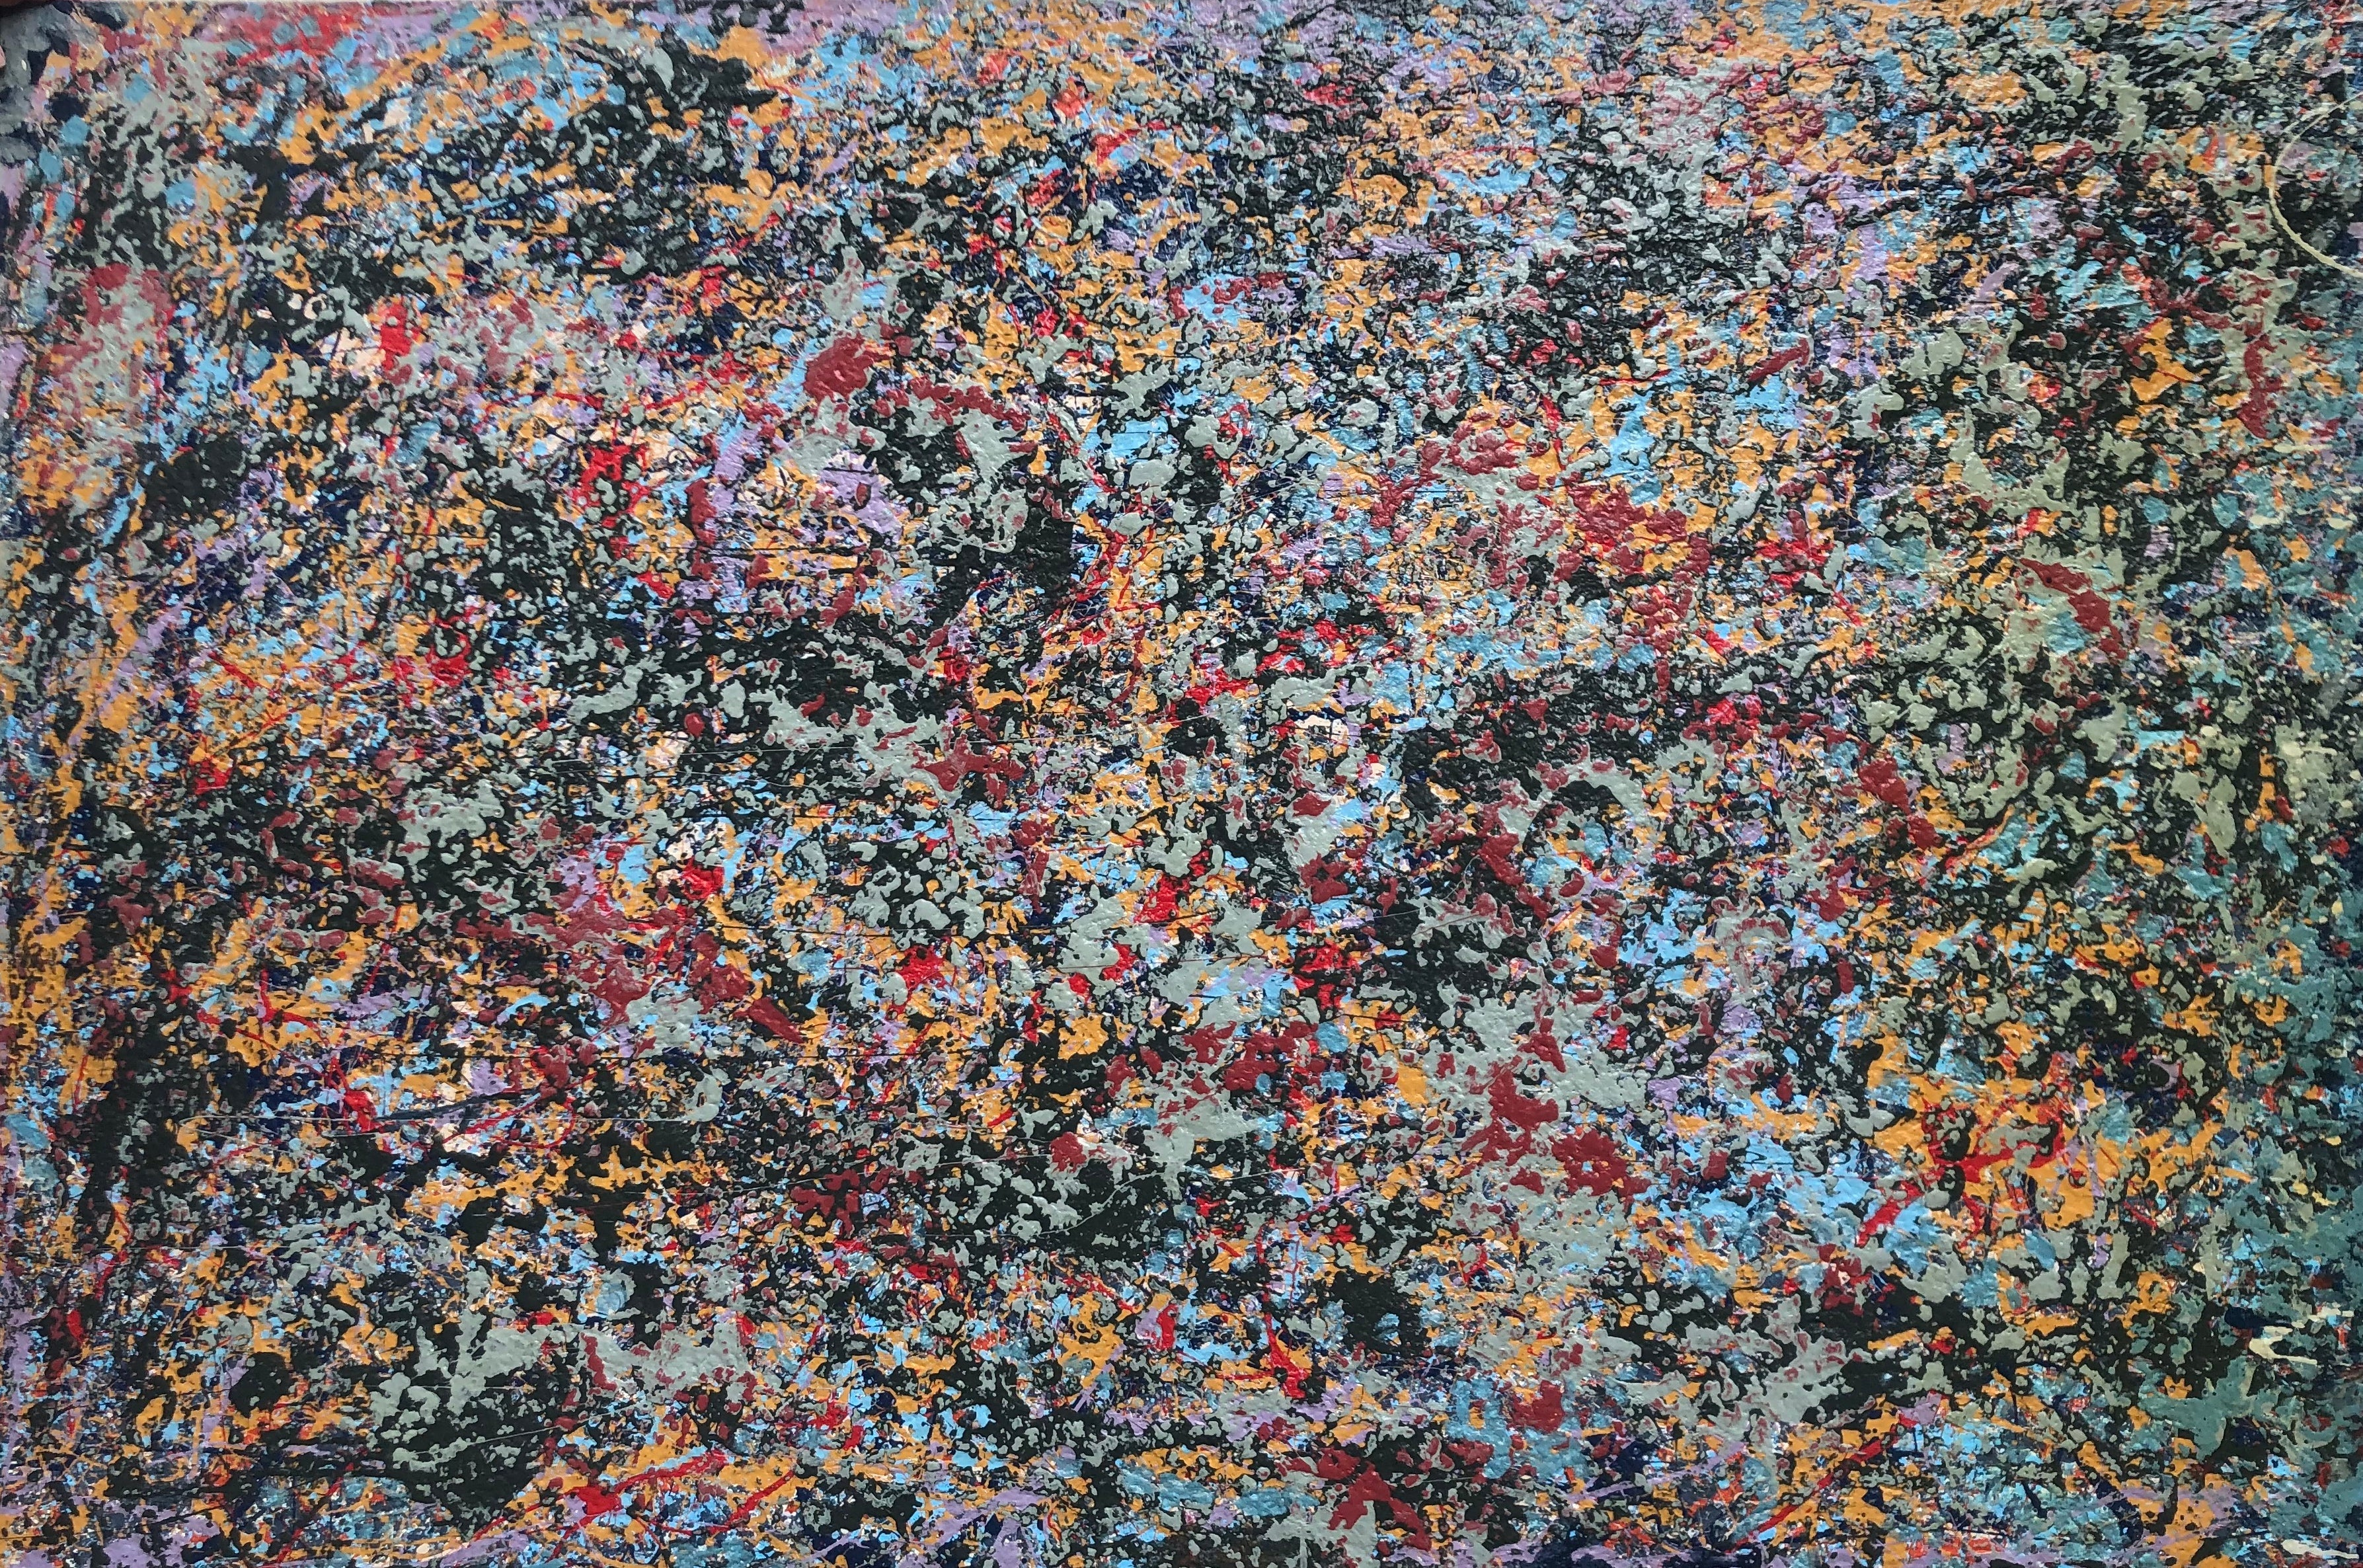 Galaxy Drip Abstract Painting